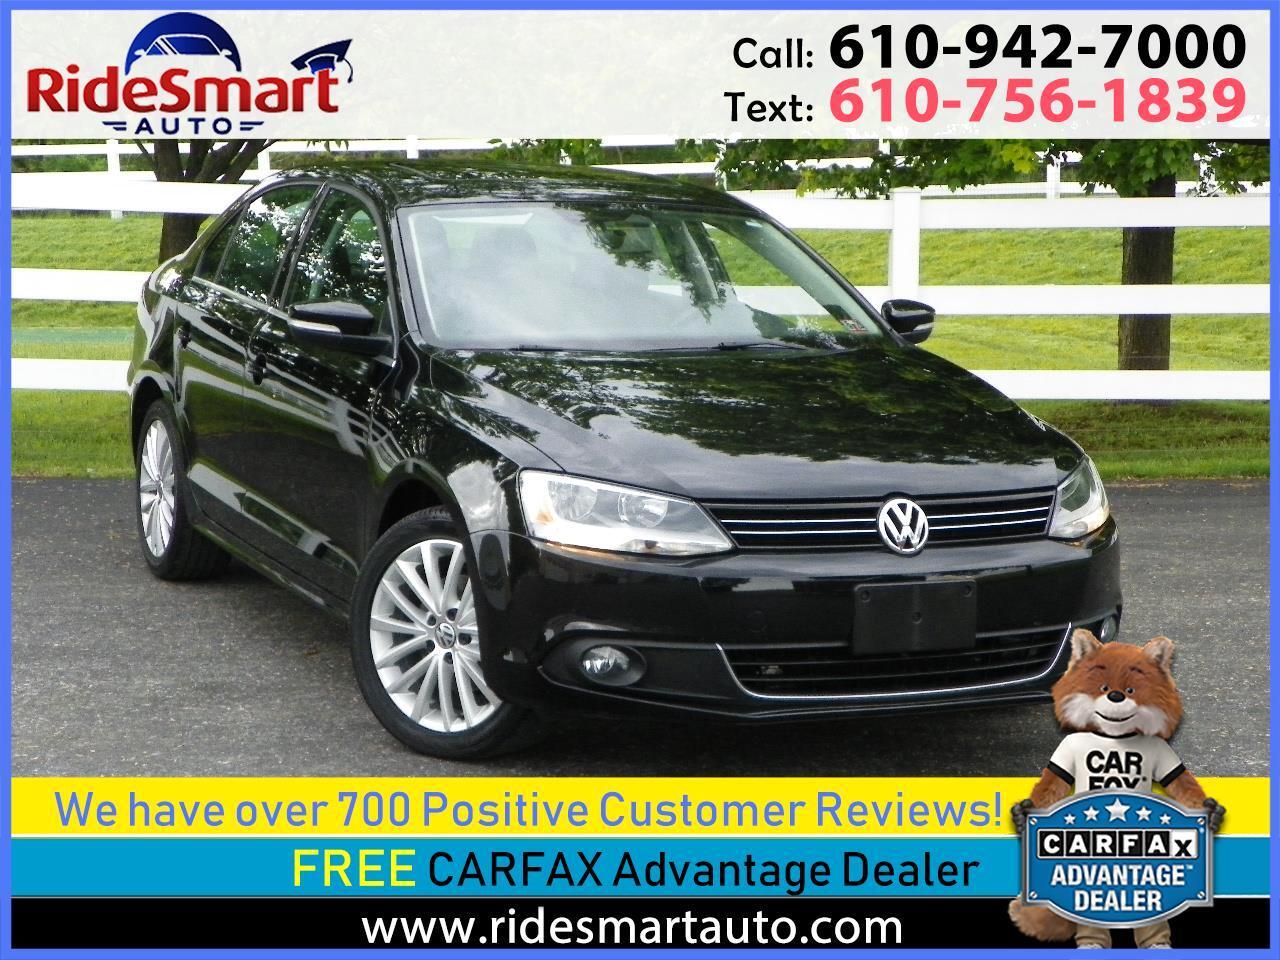 2014 Volkswagen Jetta TDI w/Premium & Navigation